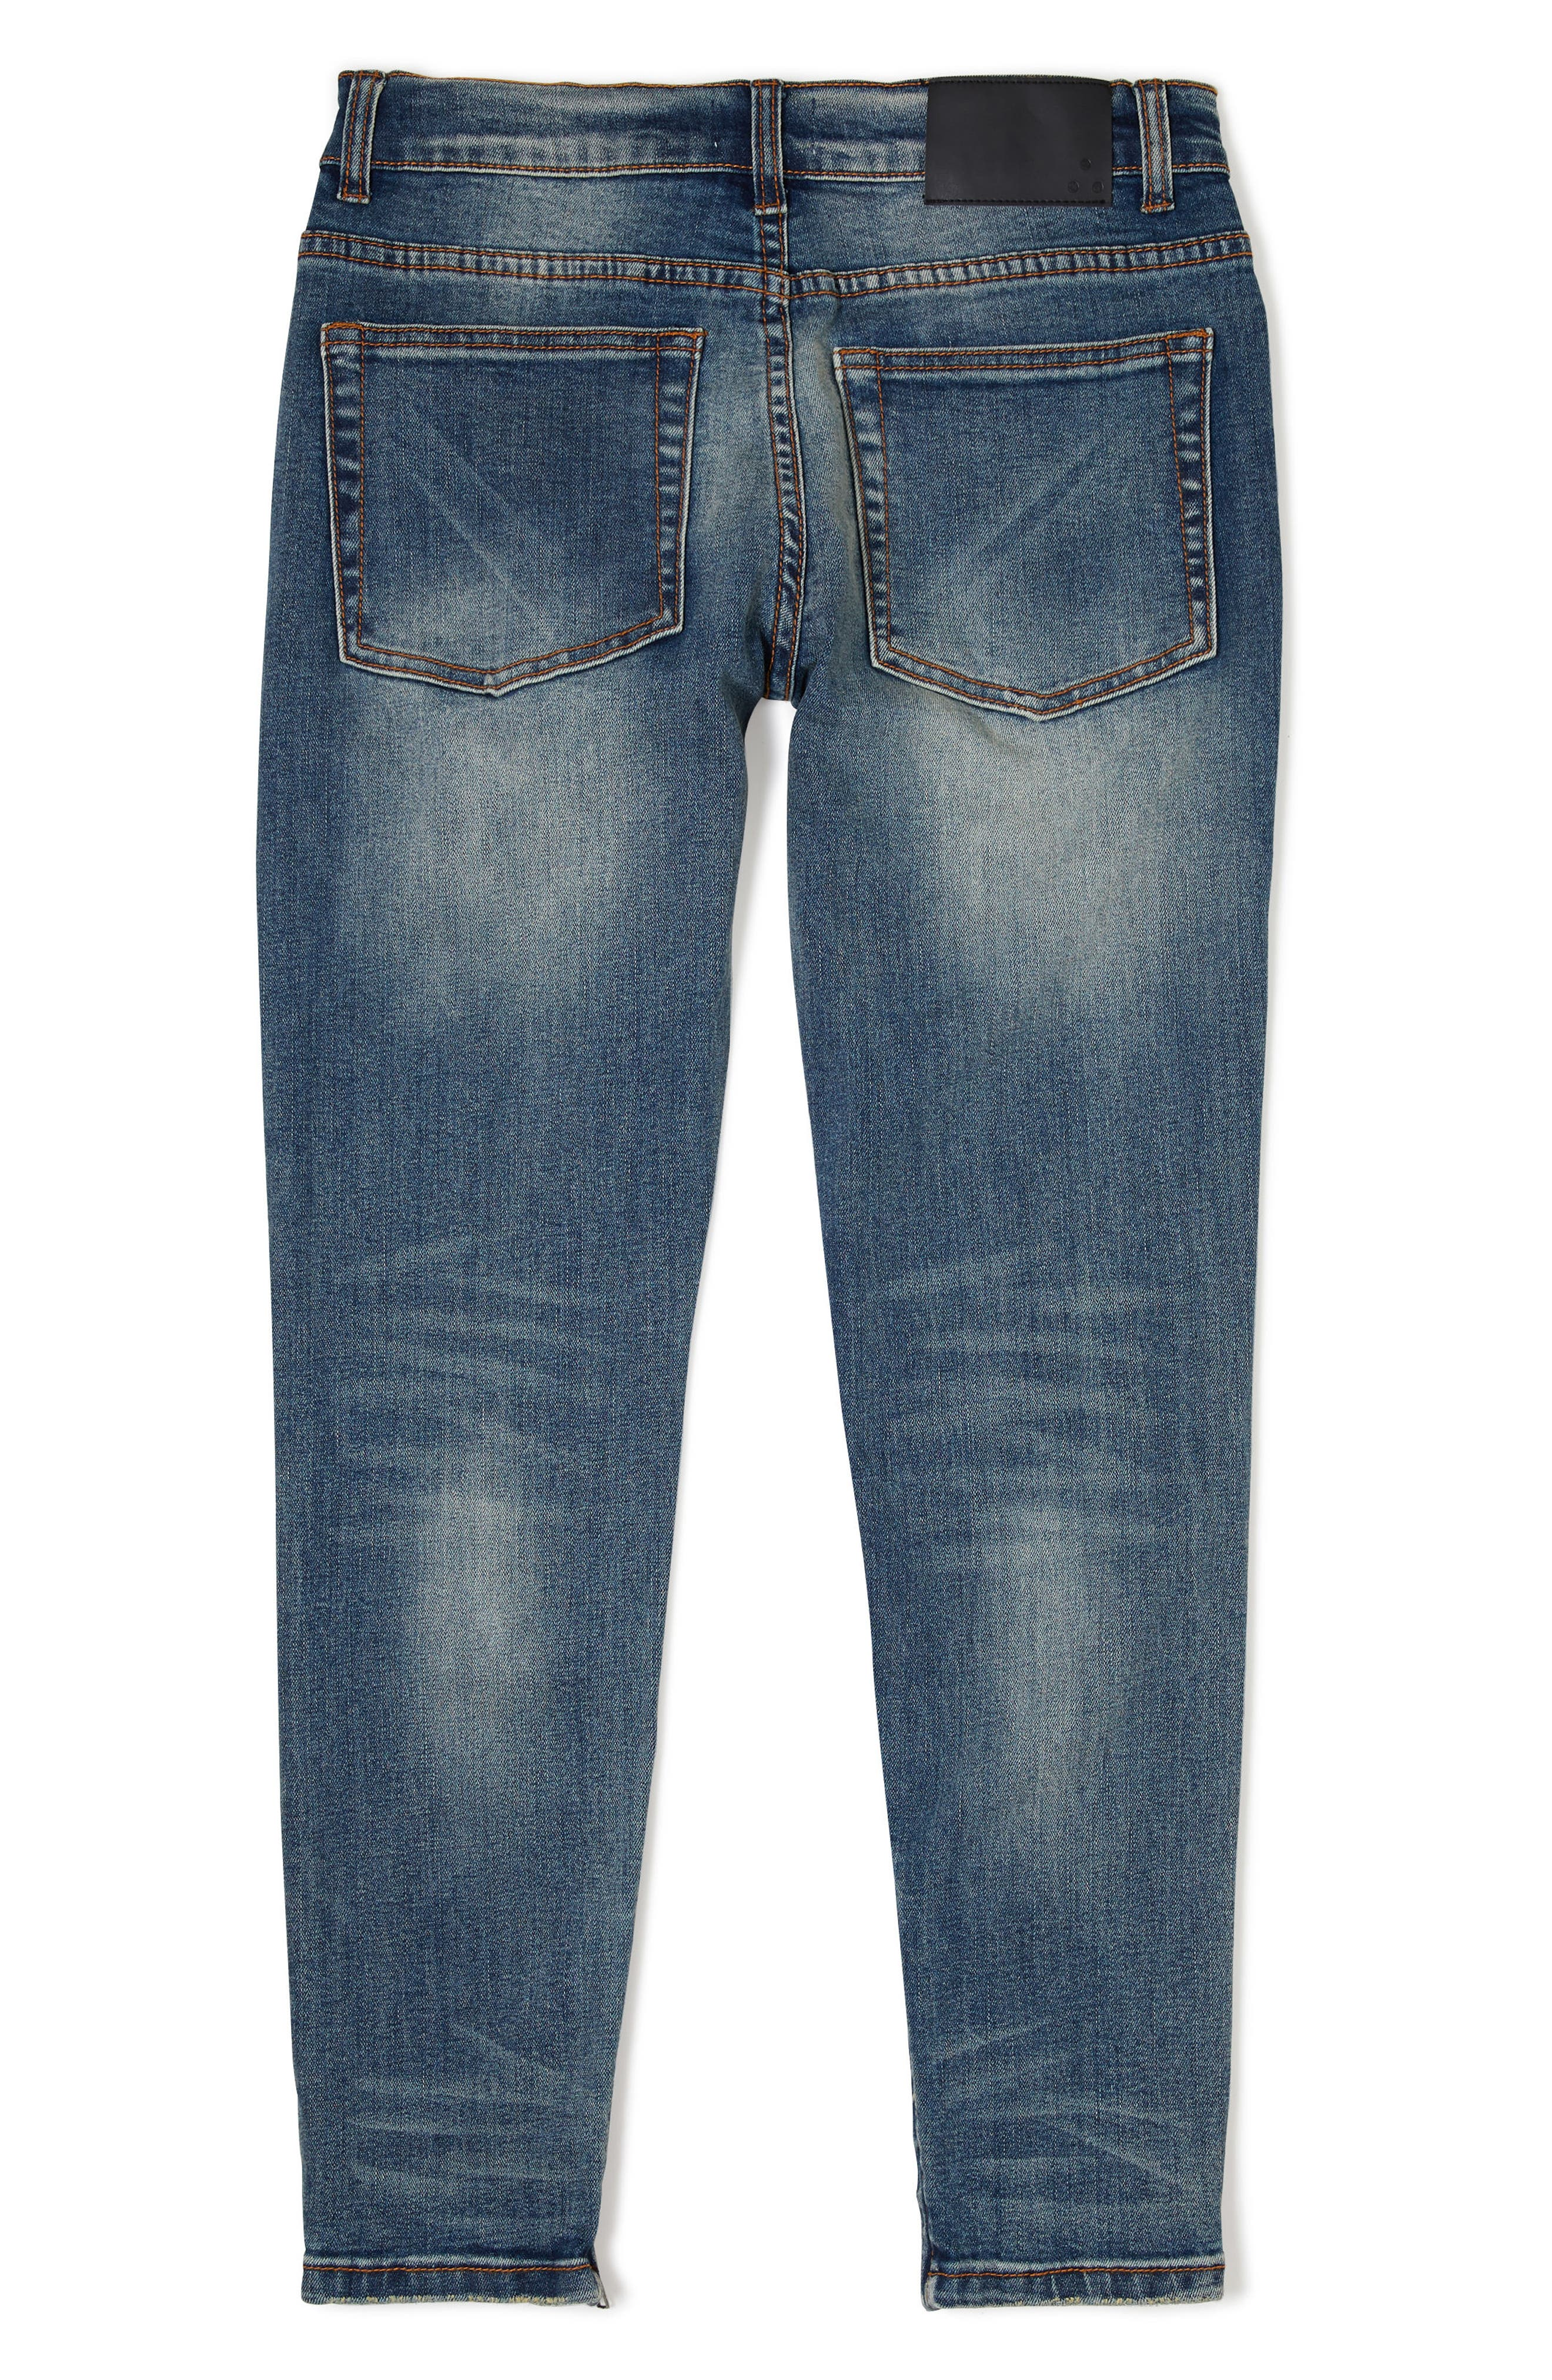 Sand Blasted Moto Skinny Jeans Big Boys),                             Alternate thumbnail 2, color,                             Dark Wash Denim